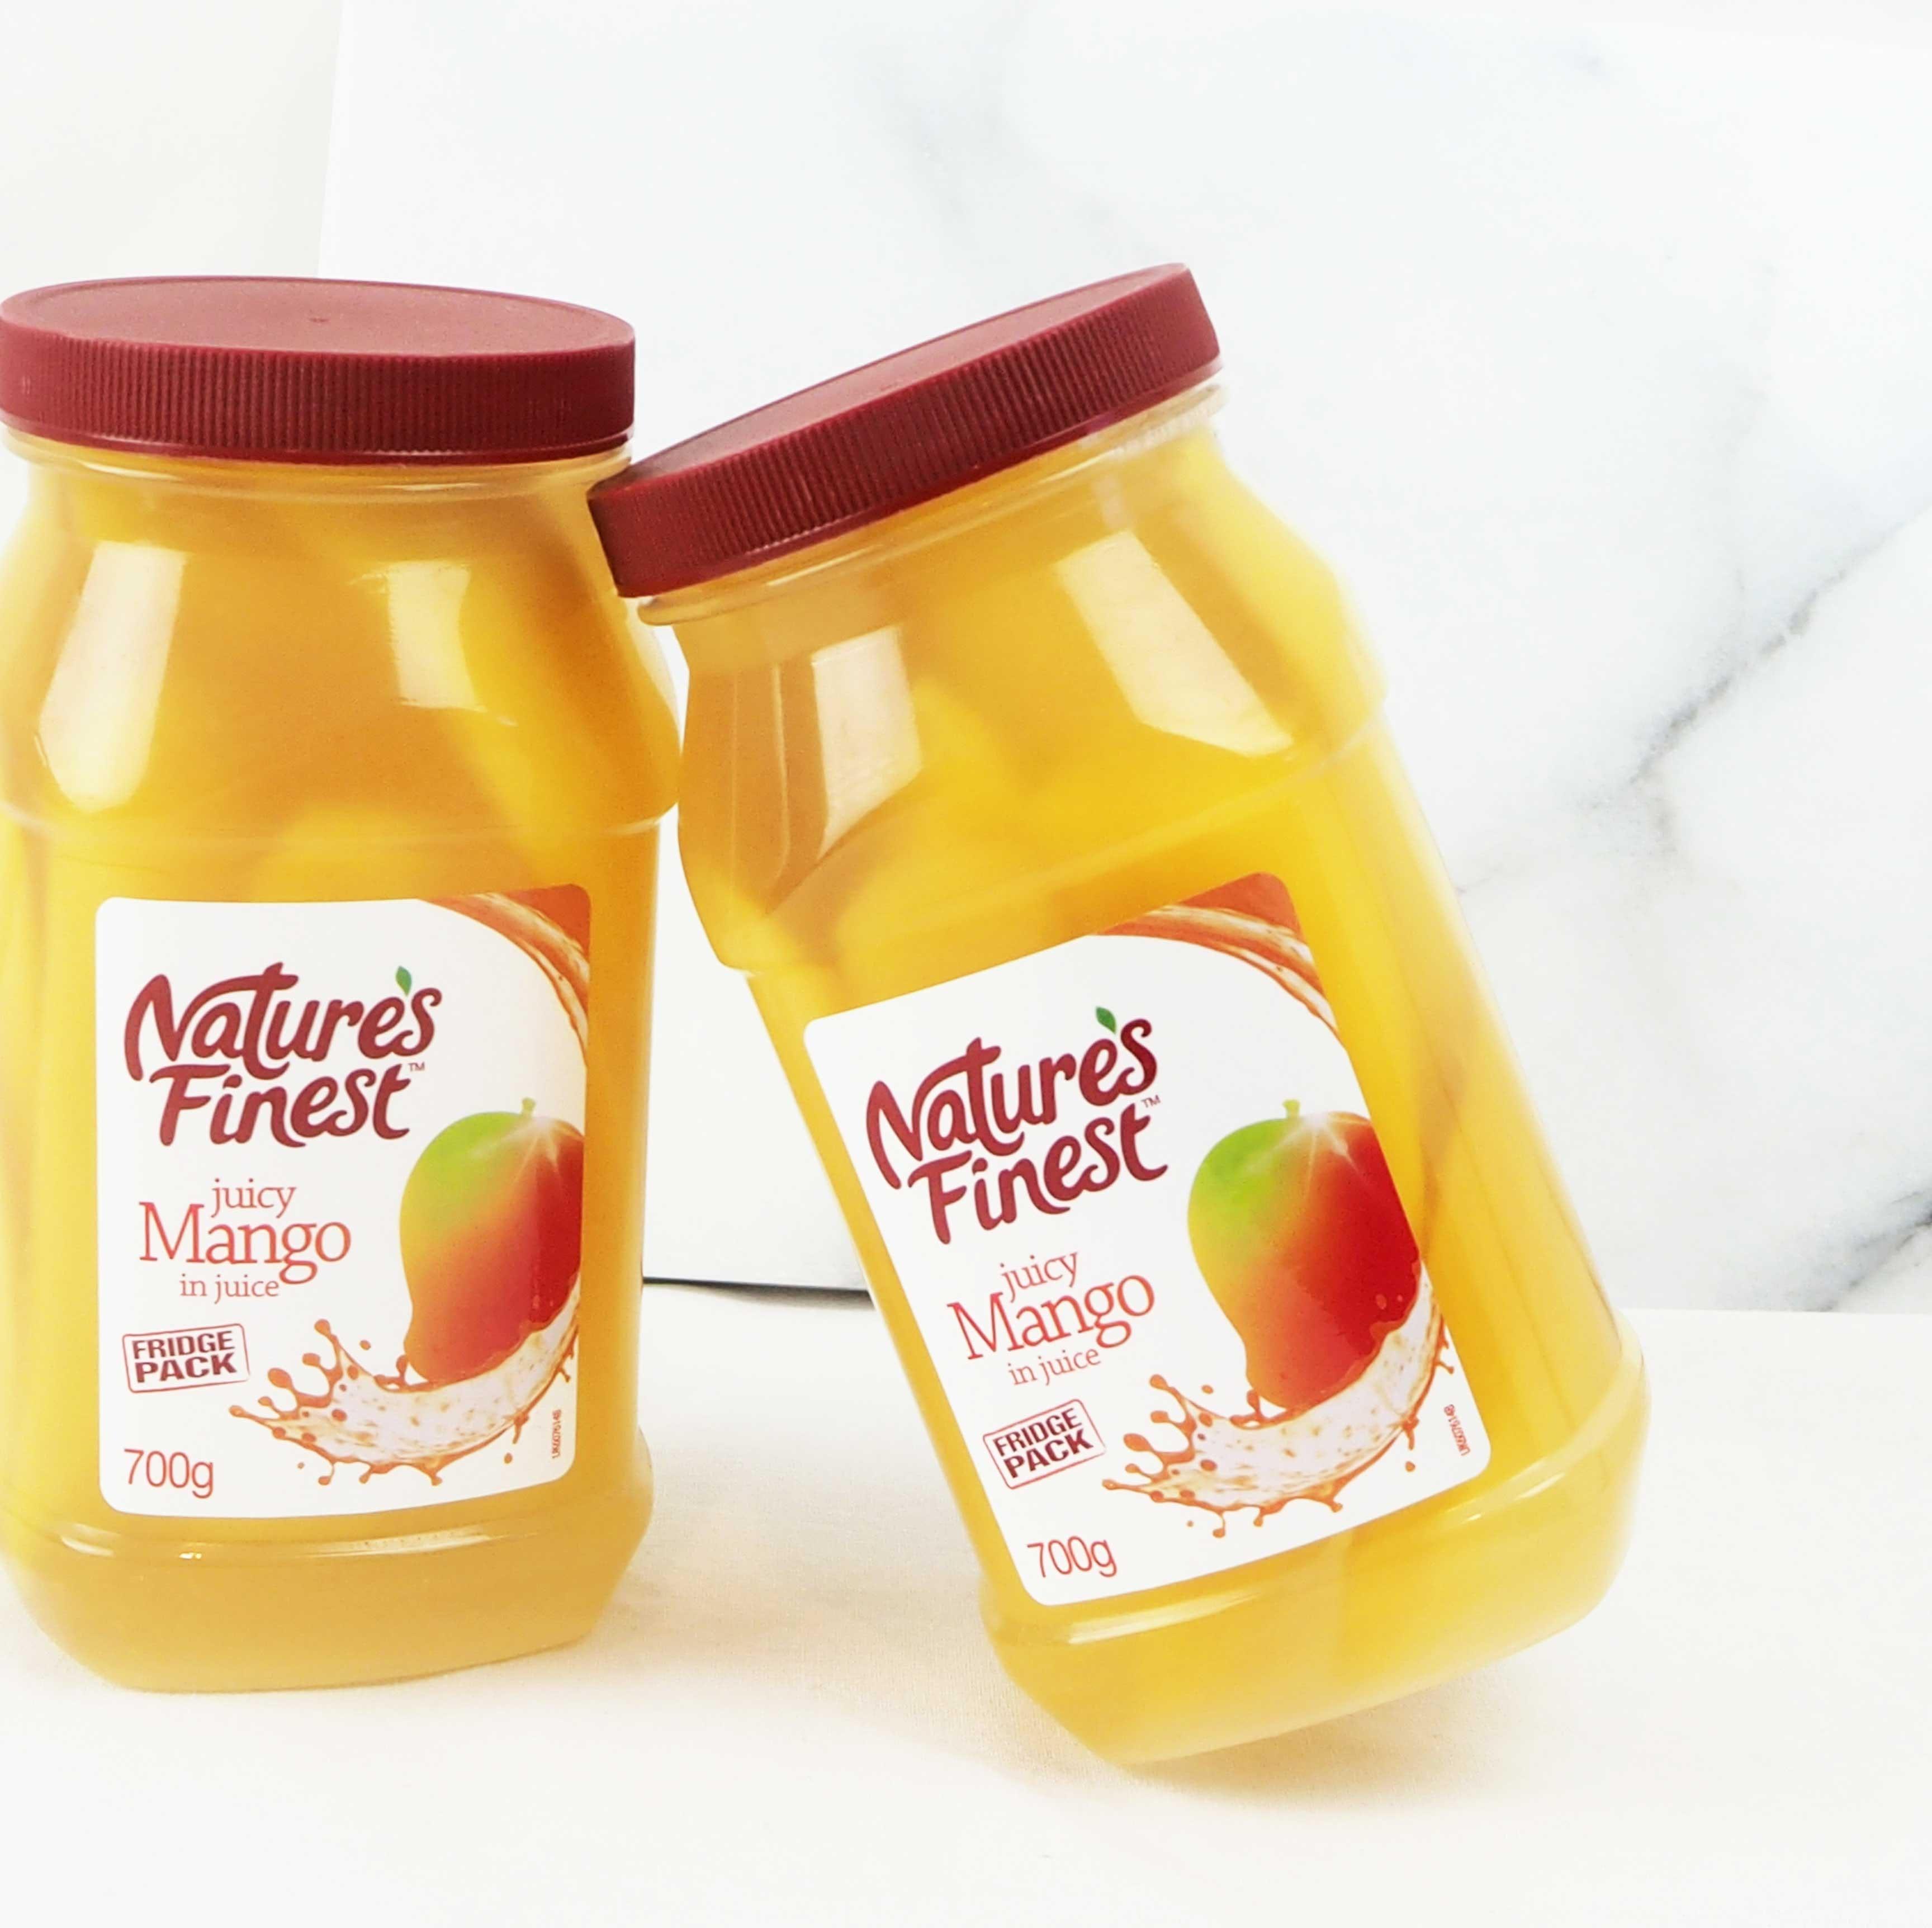 NATURE'S FINEST FRUIT POT BUNDLE sweepstakes